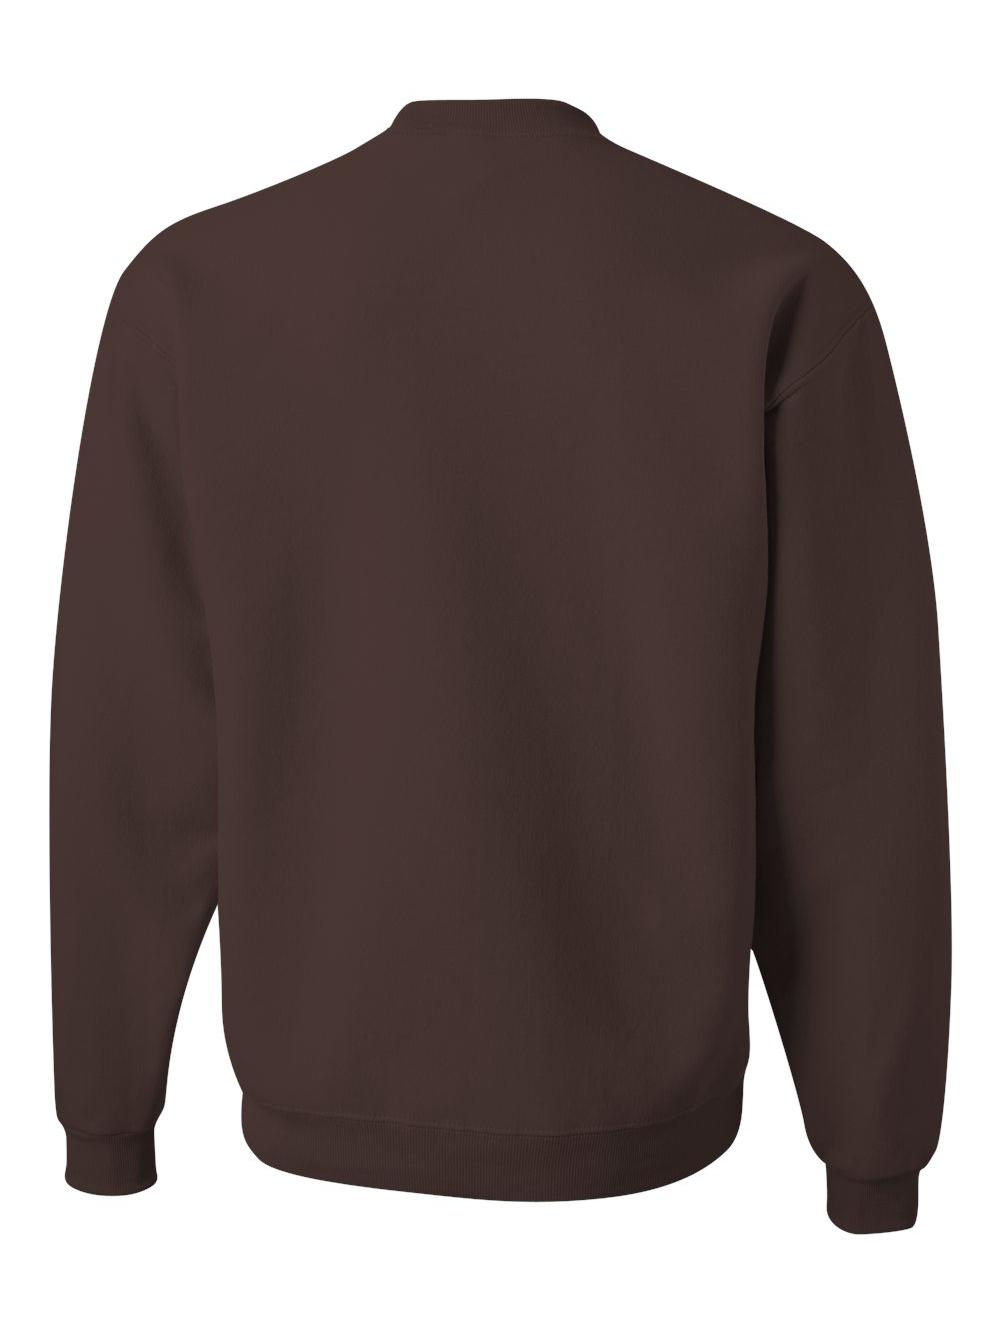 Jerzees-NuBlend-Crewneck-Sweatshirt-562MR thumbnail 25